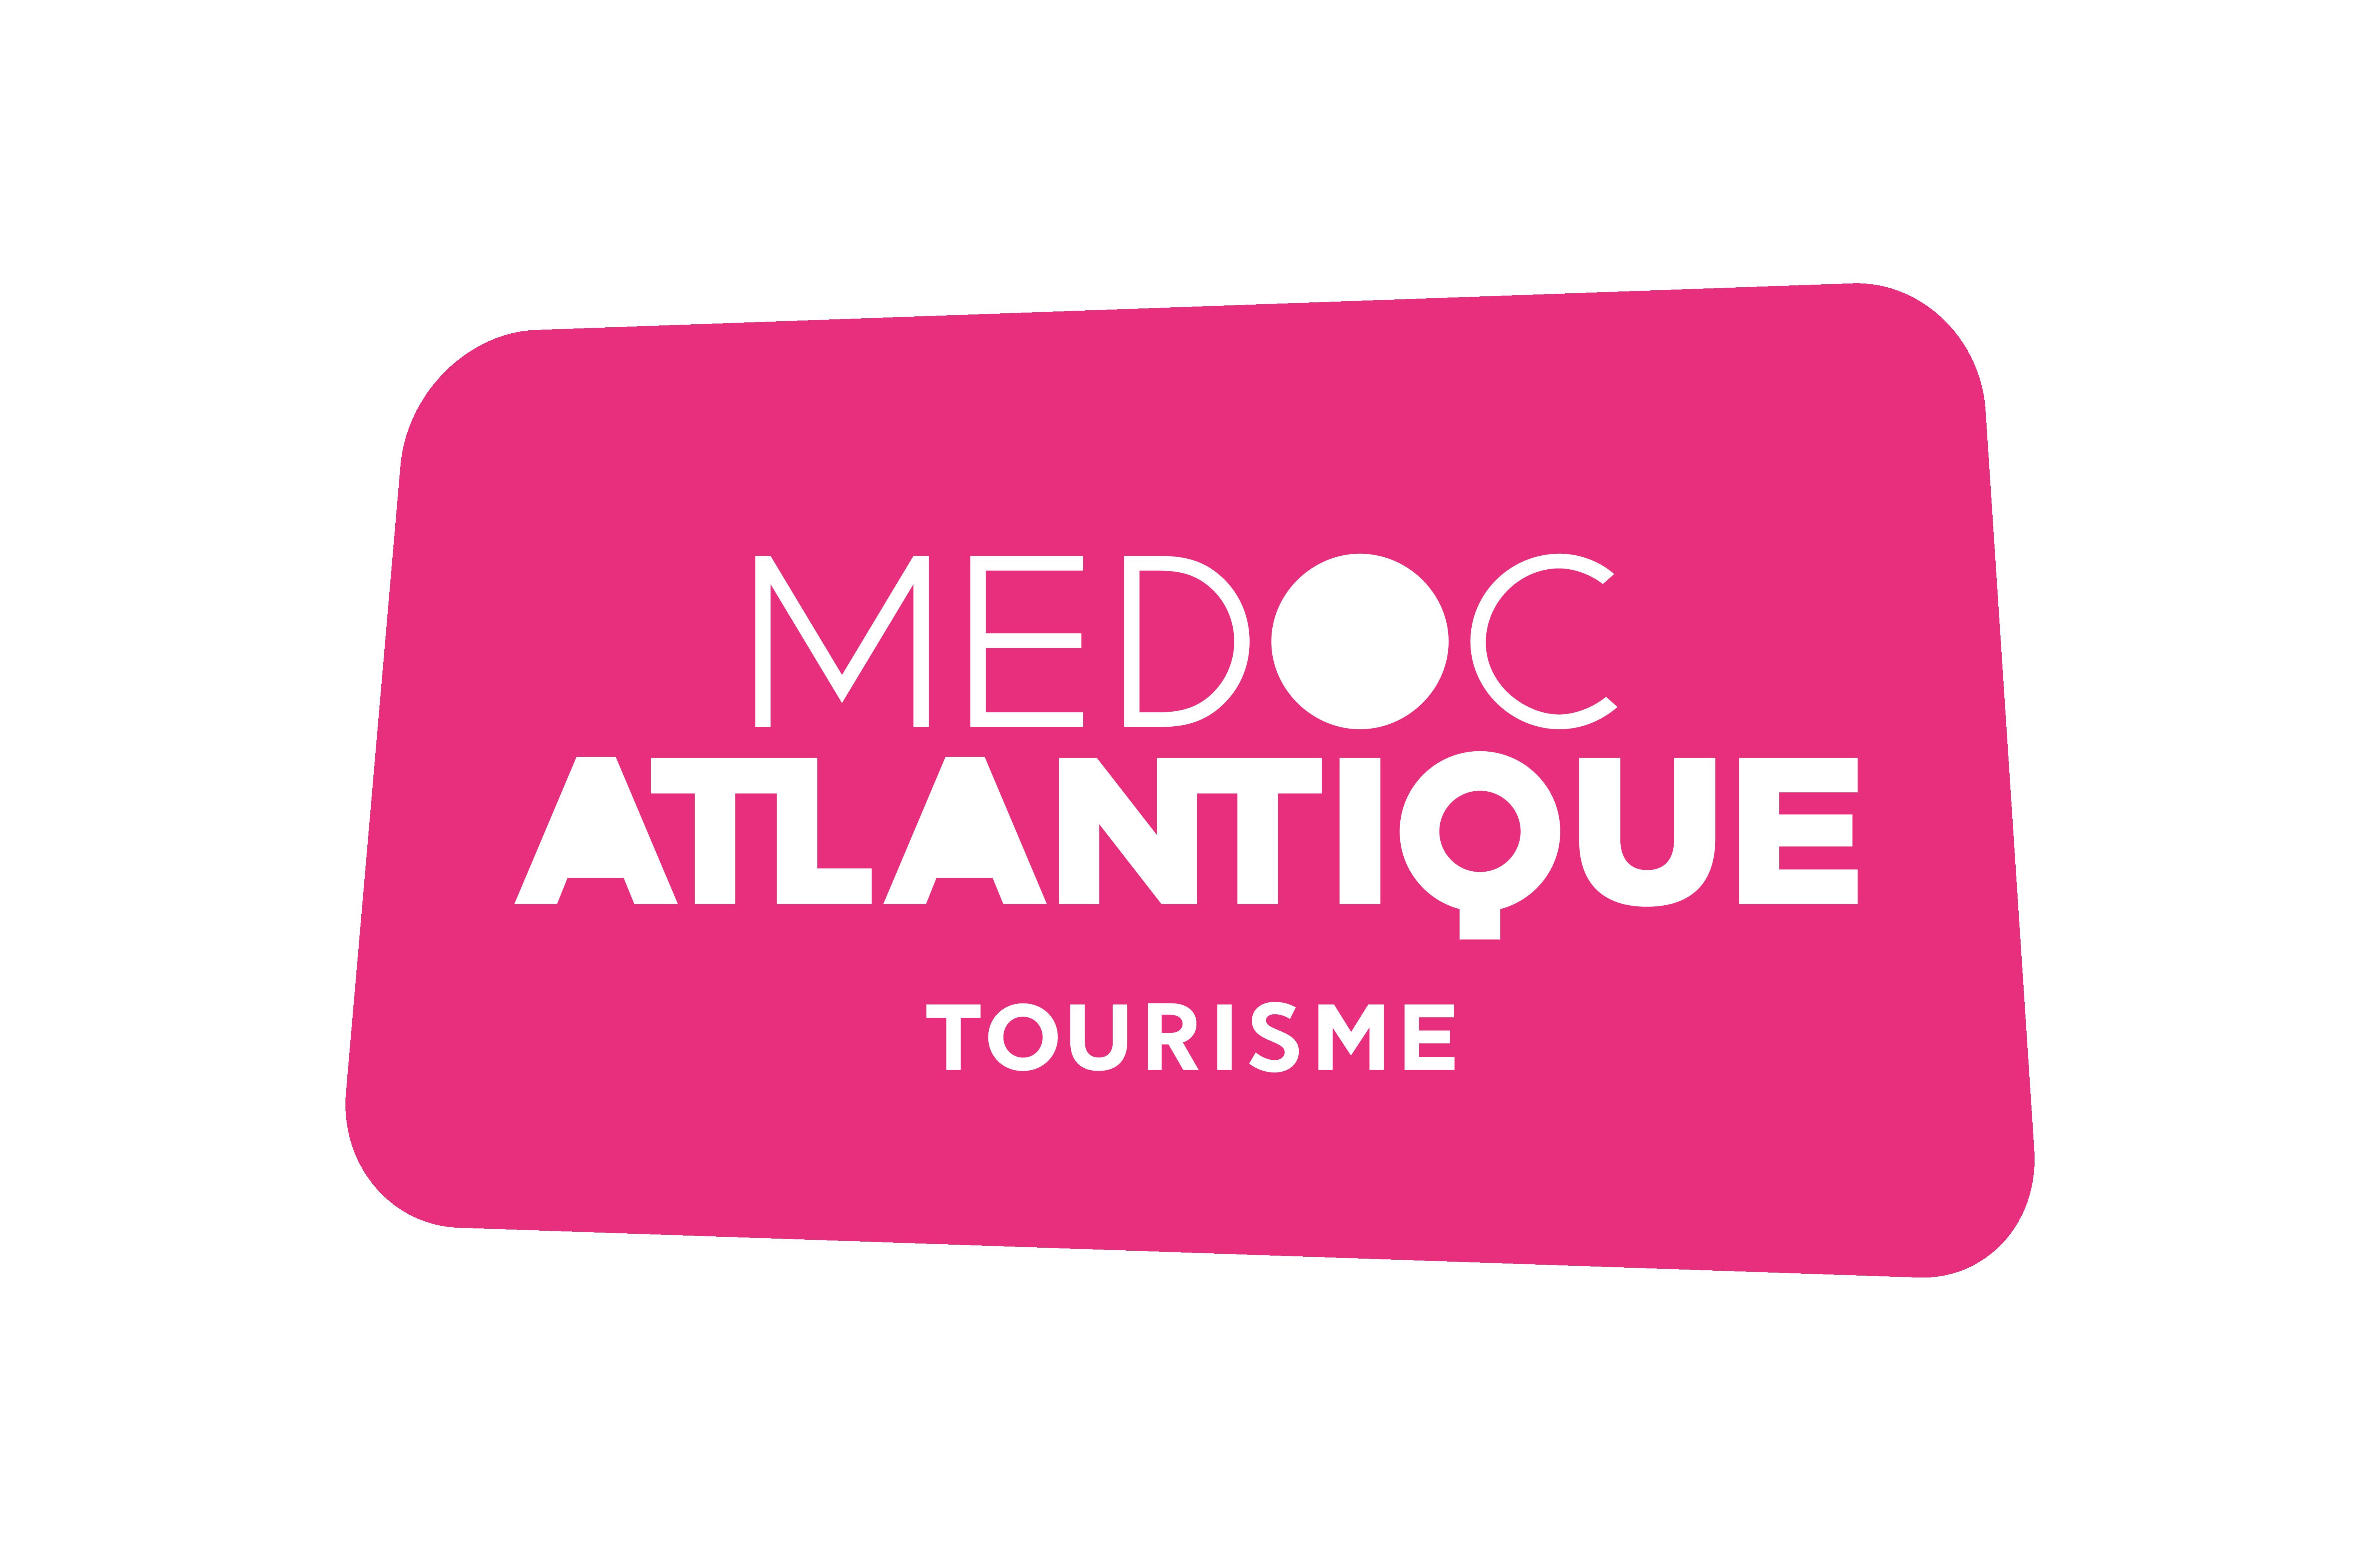 https://www.medoc-atlantique.com/